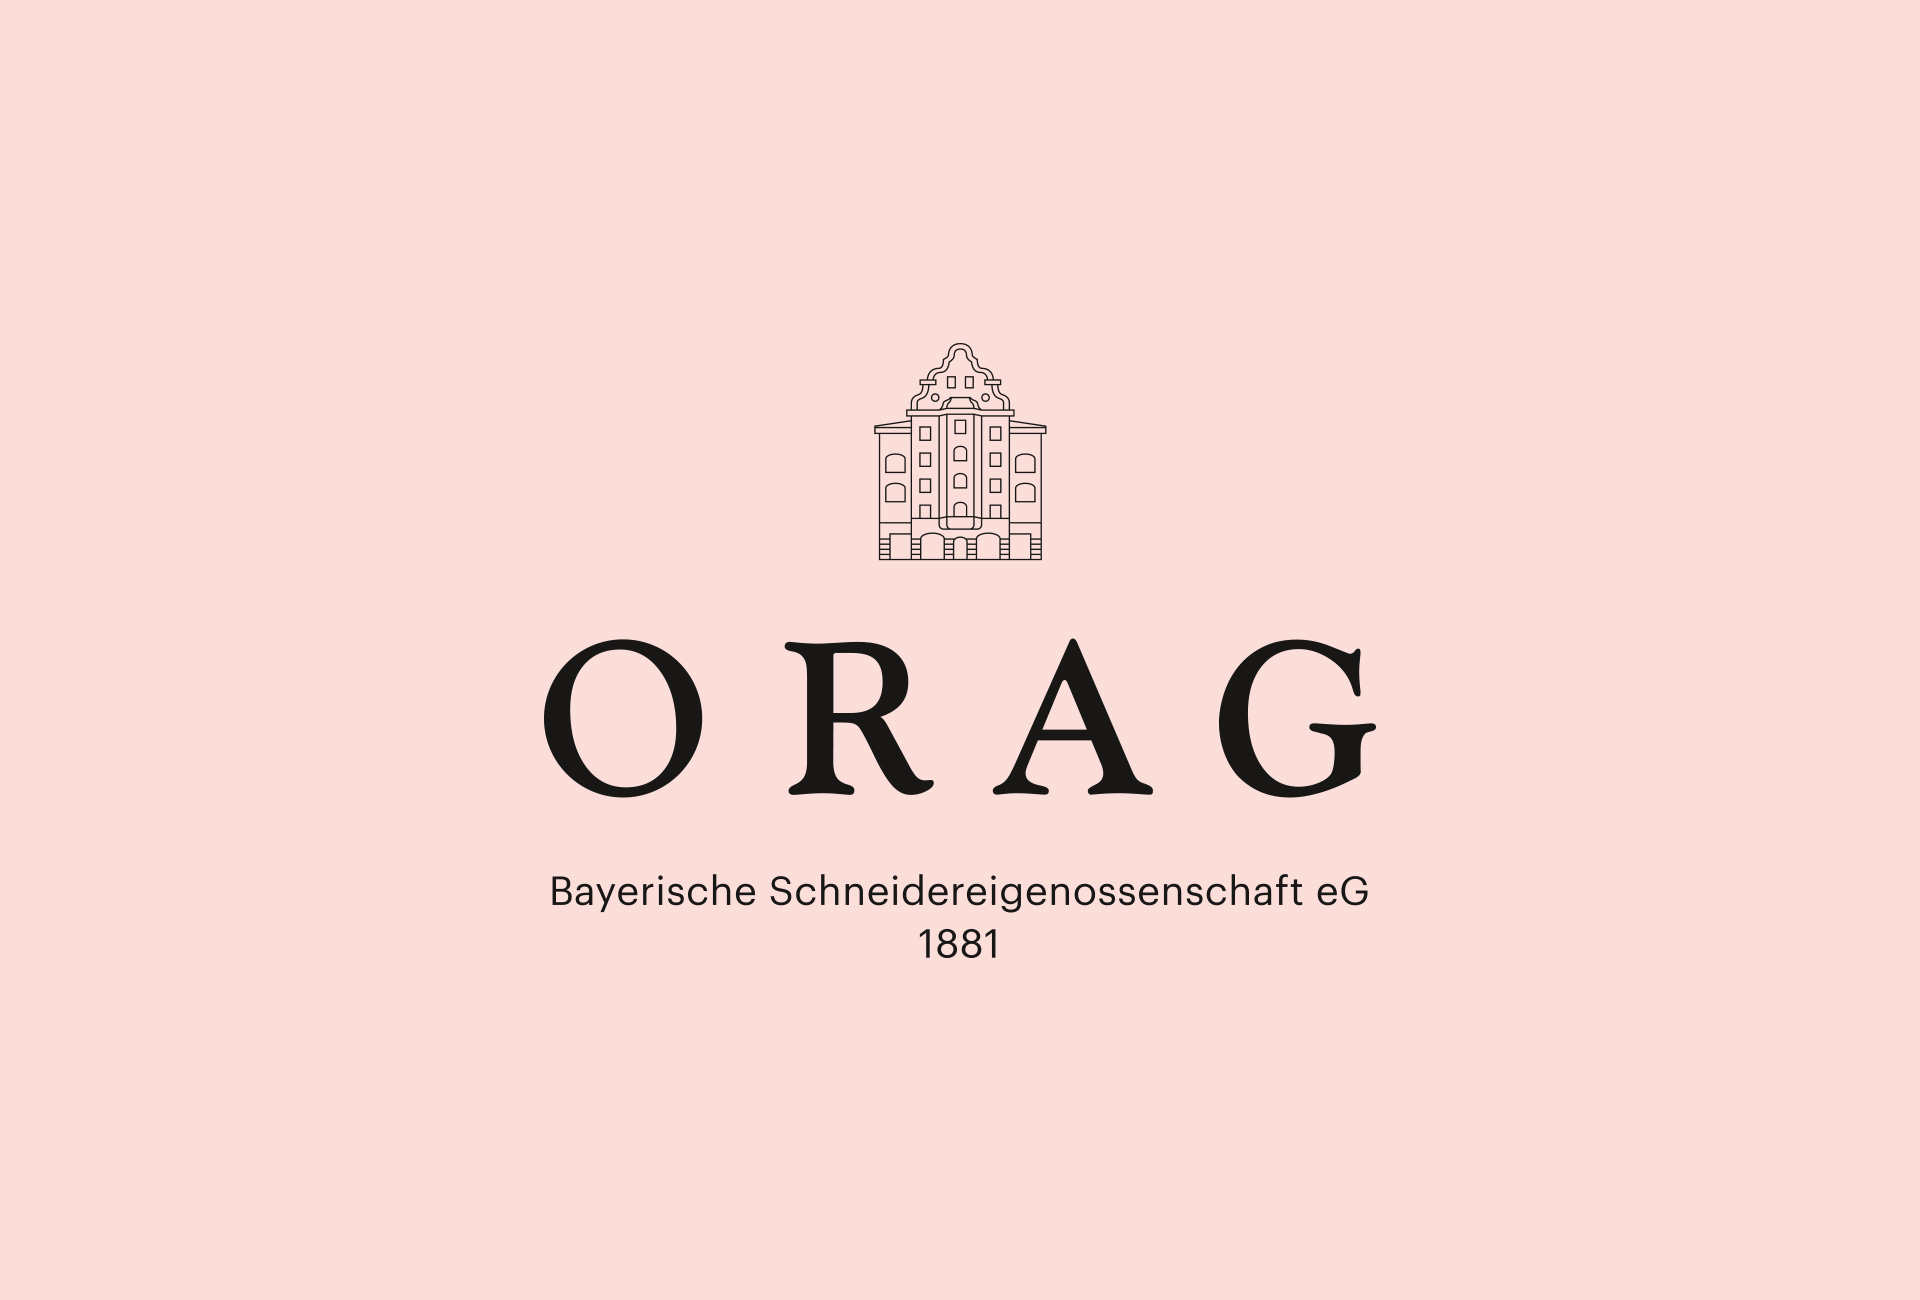 orag-2